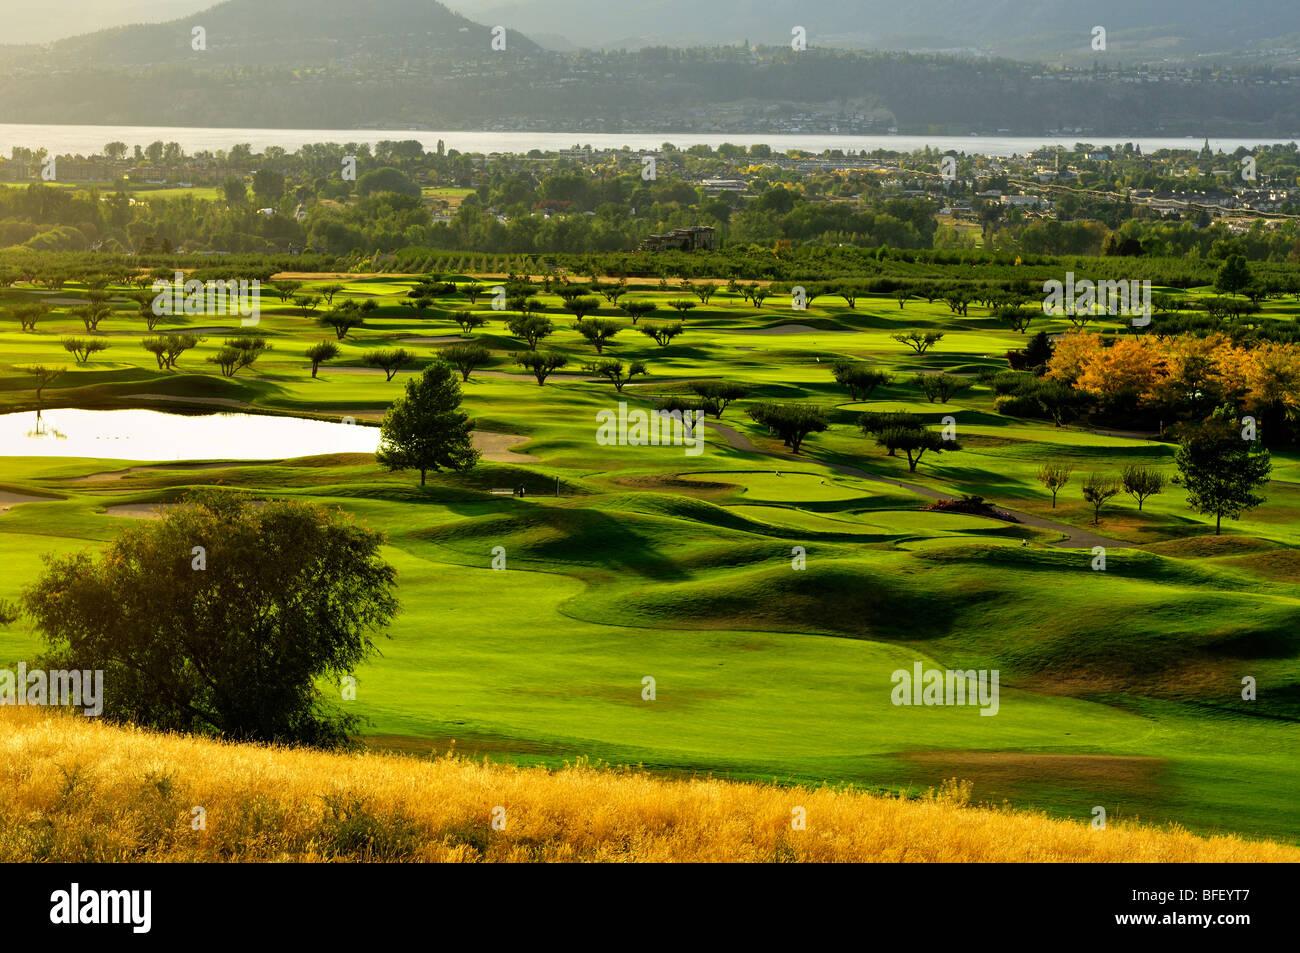 Orchard Green Golf Club near Kelowna, BC - Stock Image